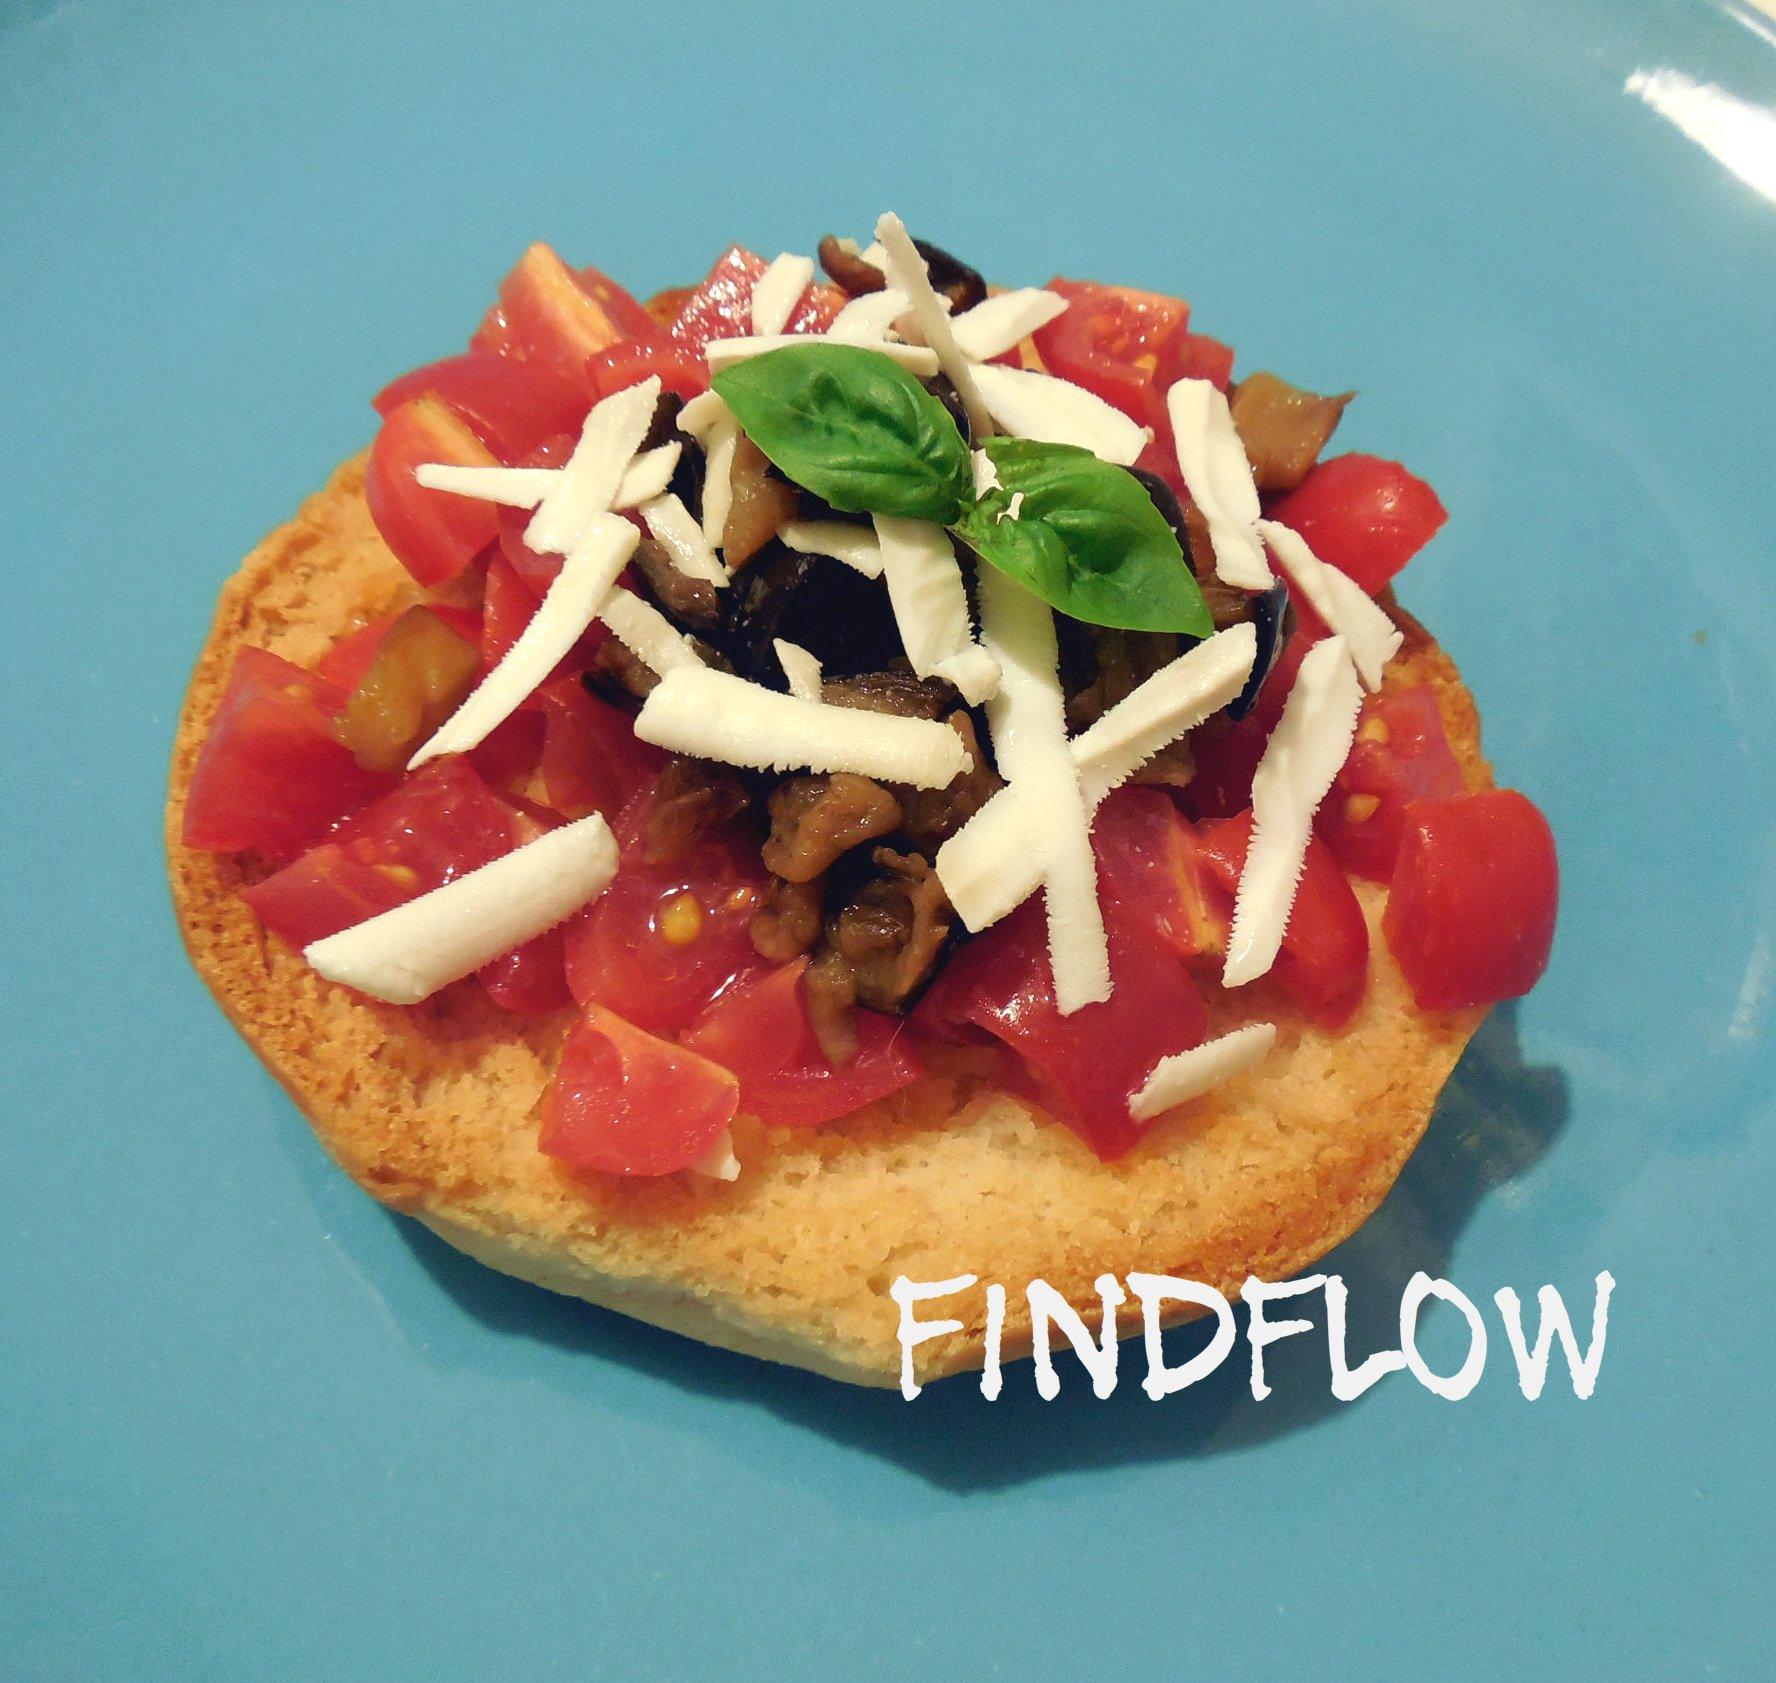 Find Flow - Friselle alla norma